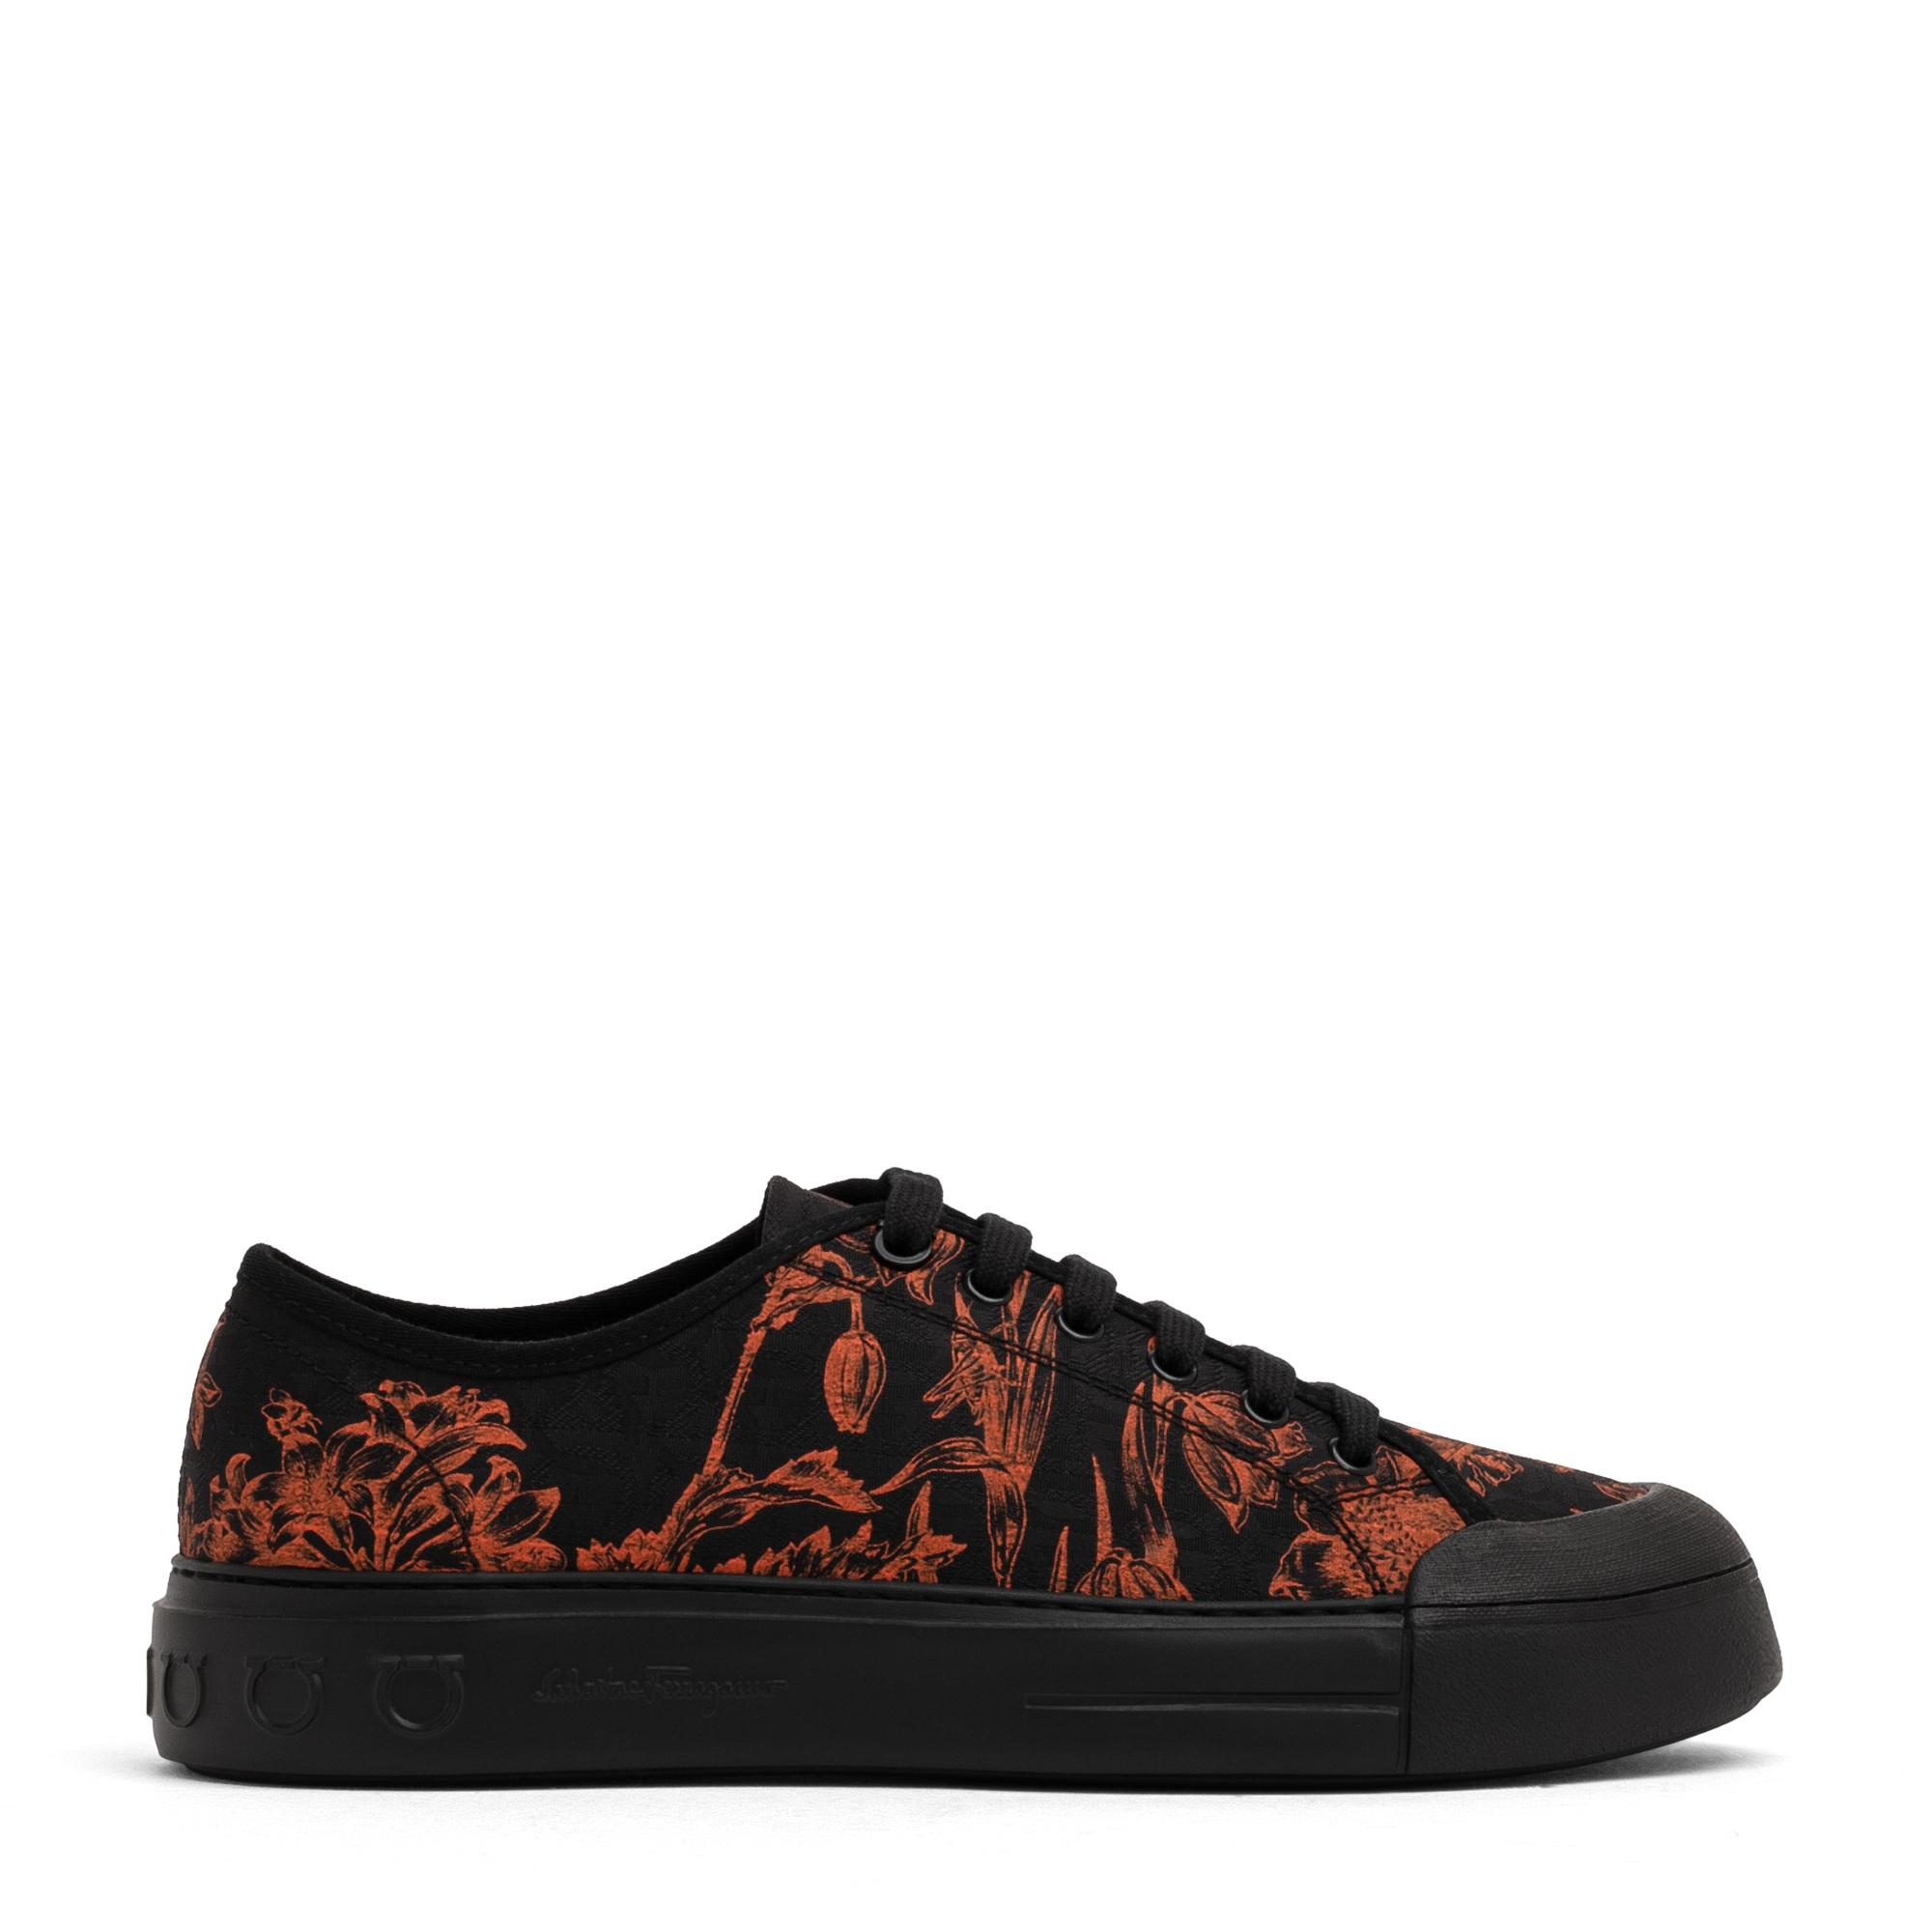 Rebel printed sneakers